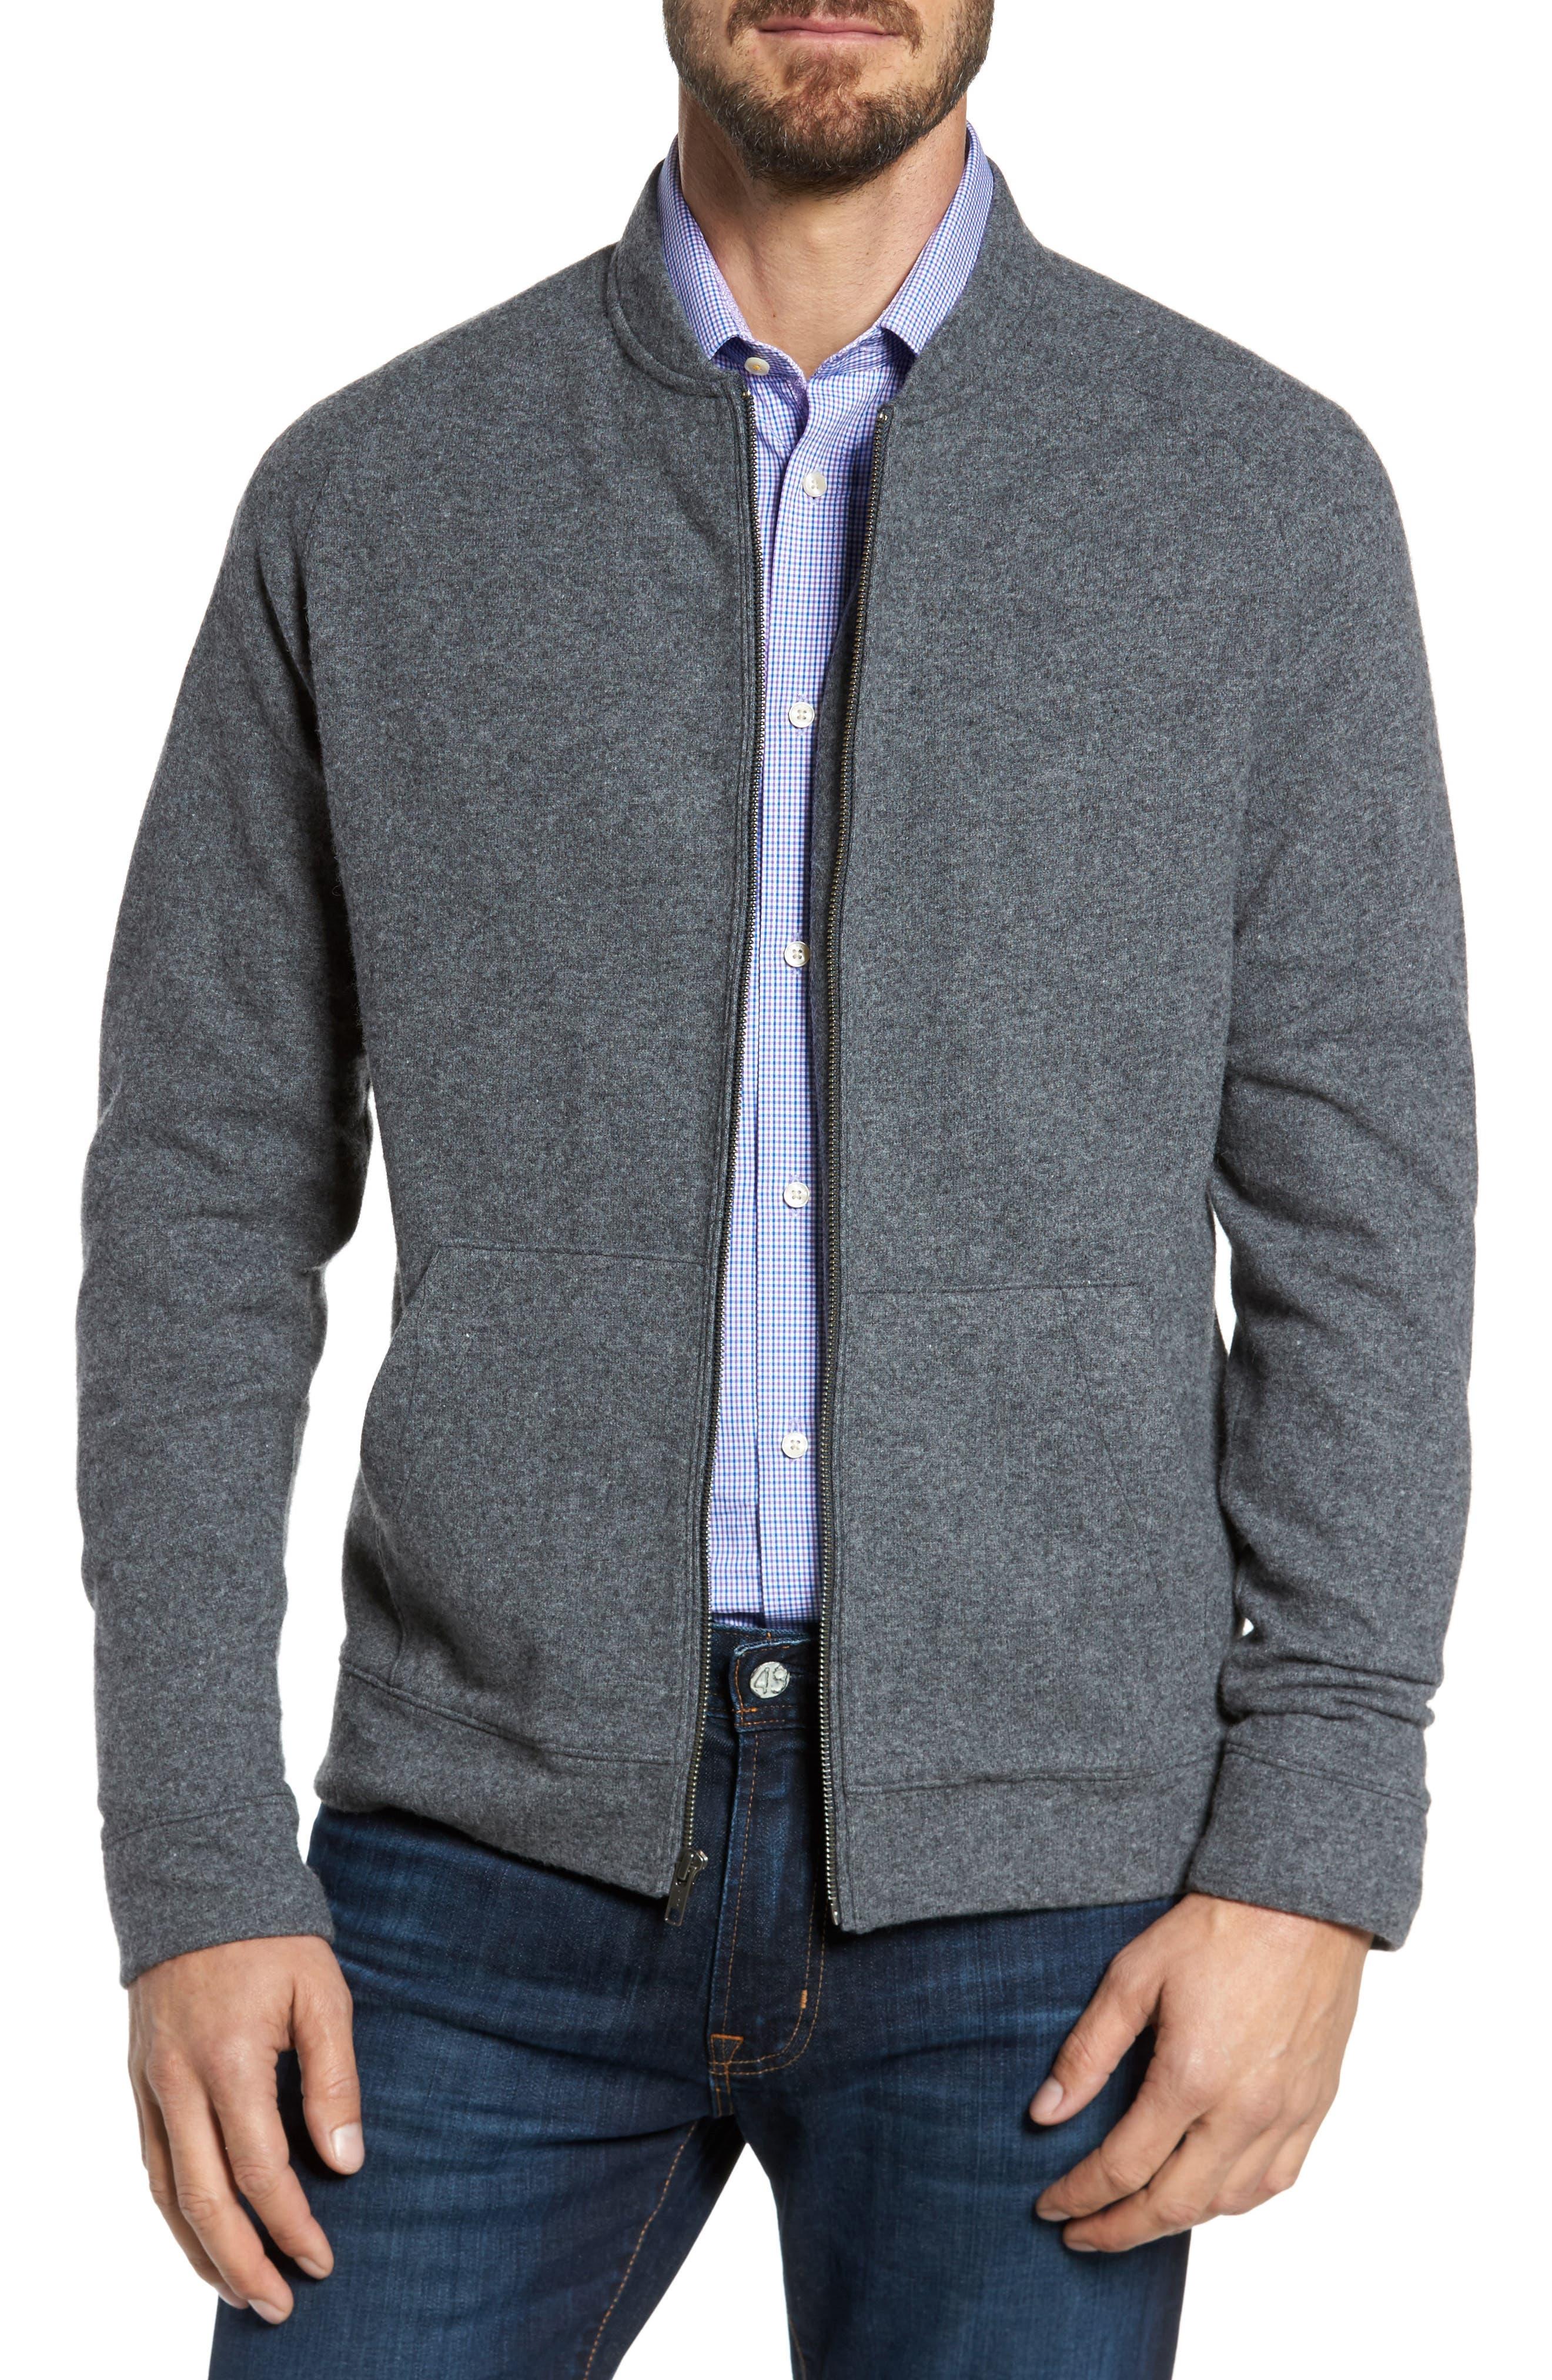 Wool Blend Fleece Bomber Jacket,                             Main thumbnail 1, color,                             Grey Charcoal